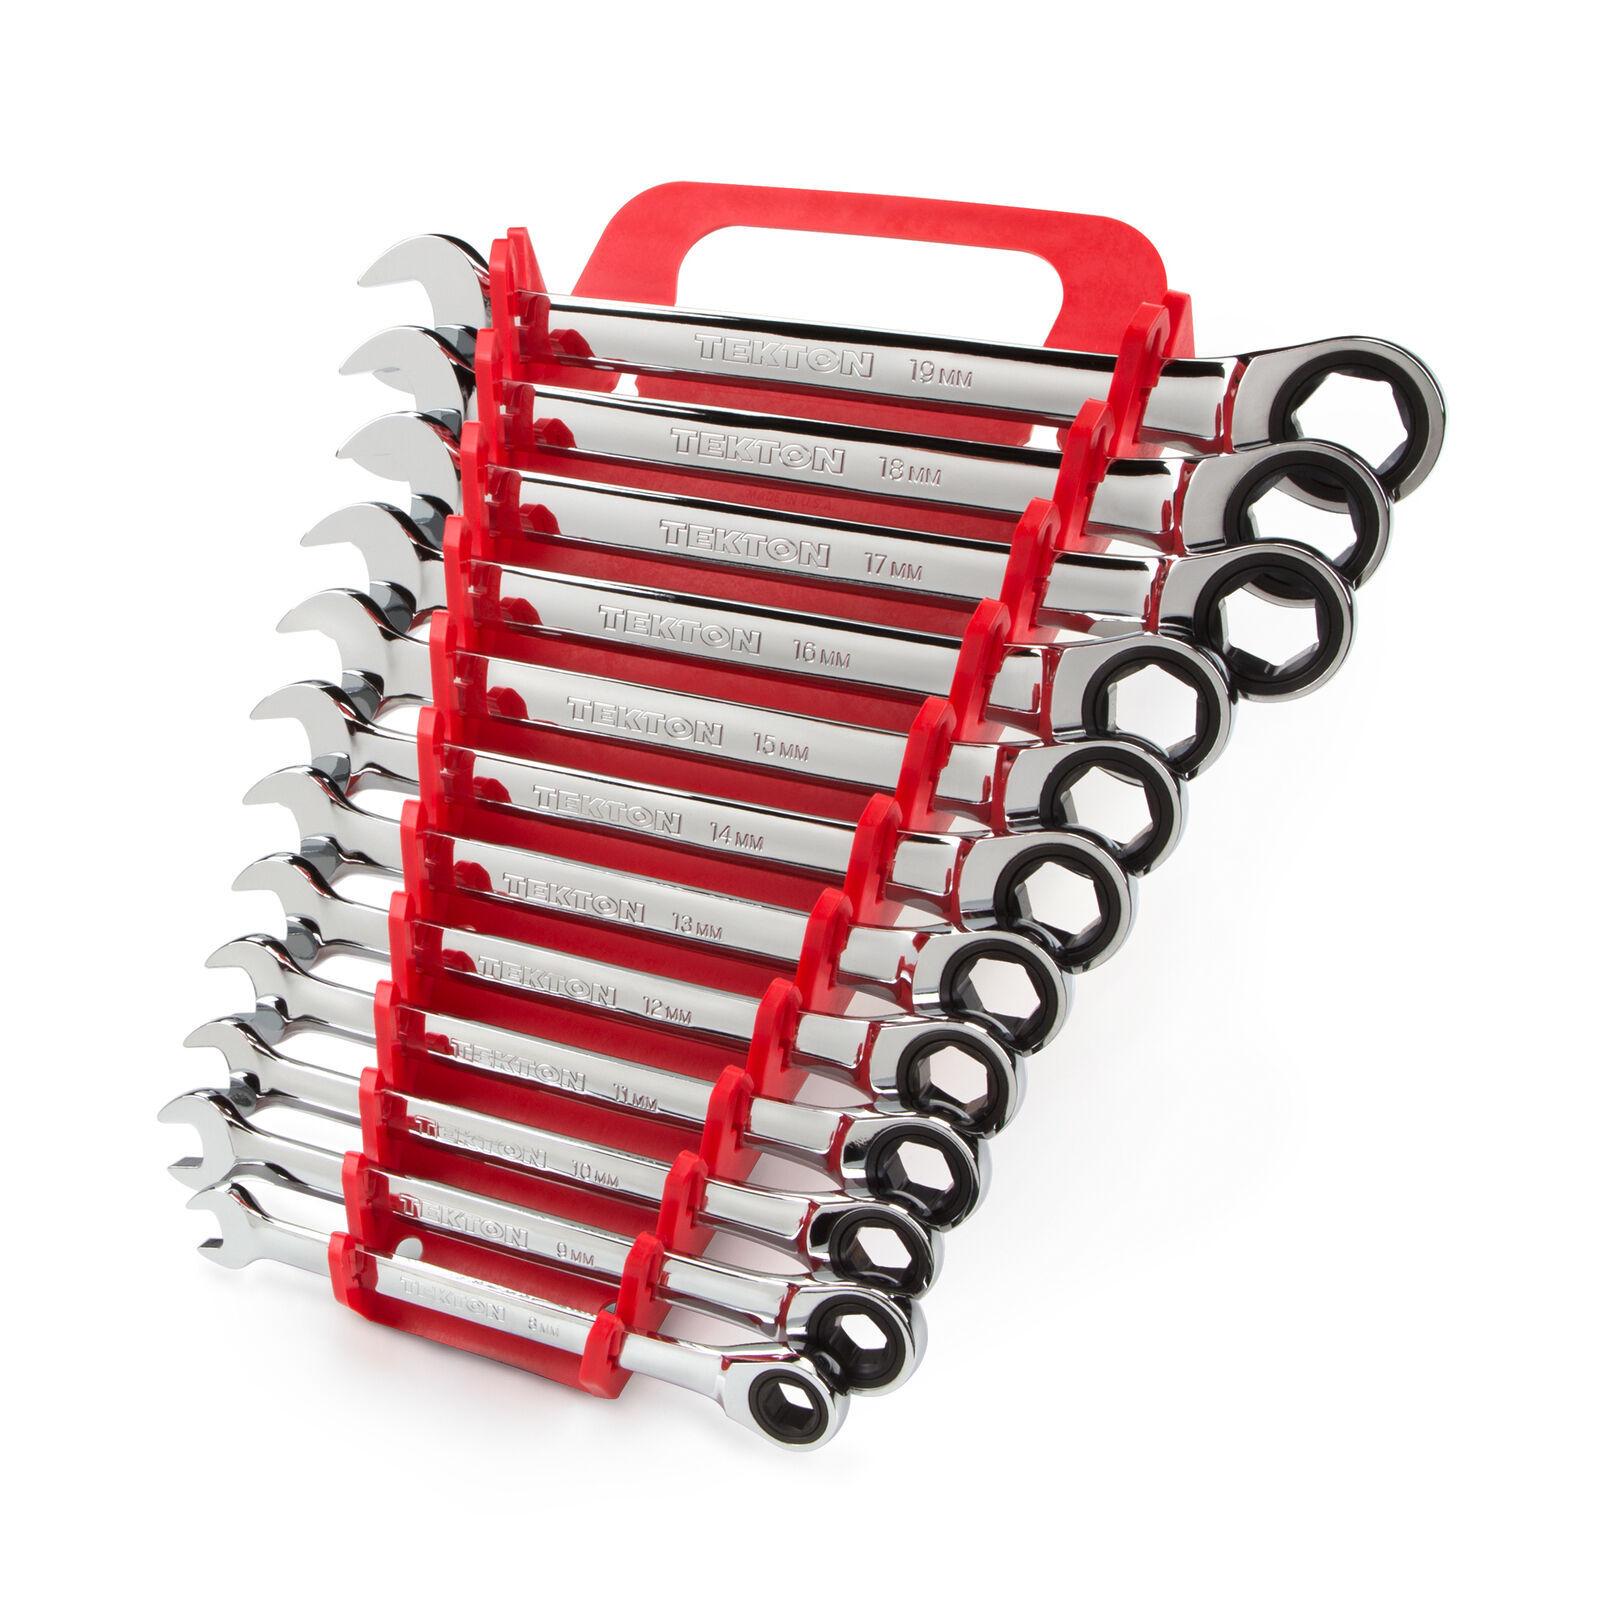 TEKTON Flex Ratcheting Combination Wrench Set, 12-Piece (8-19 mm) - Holder  - $148.49